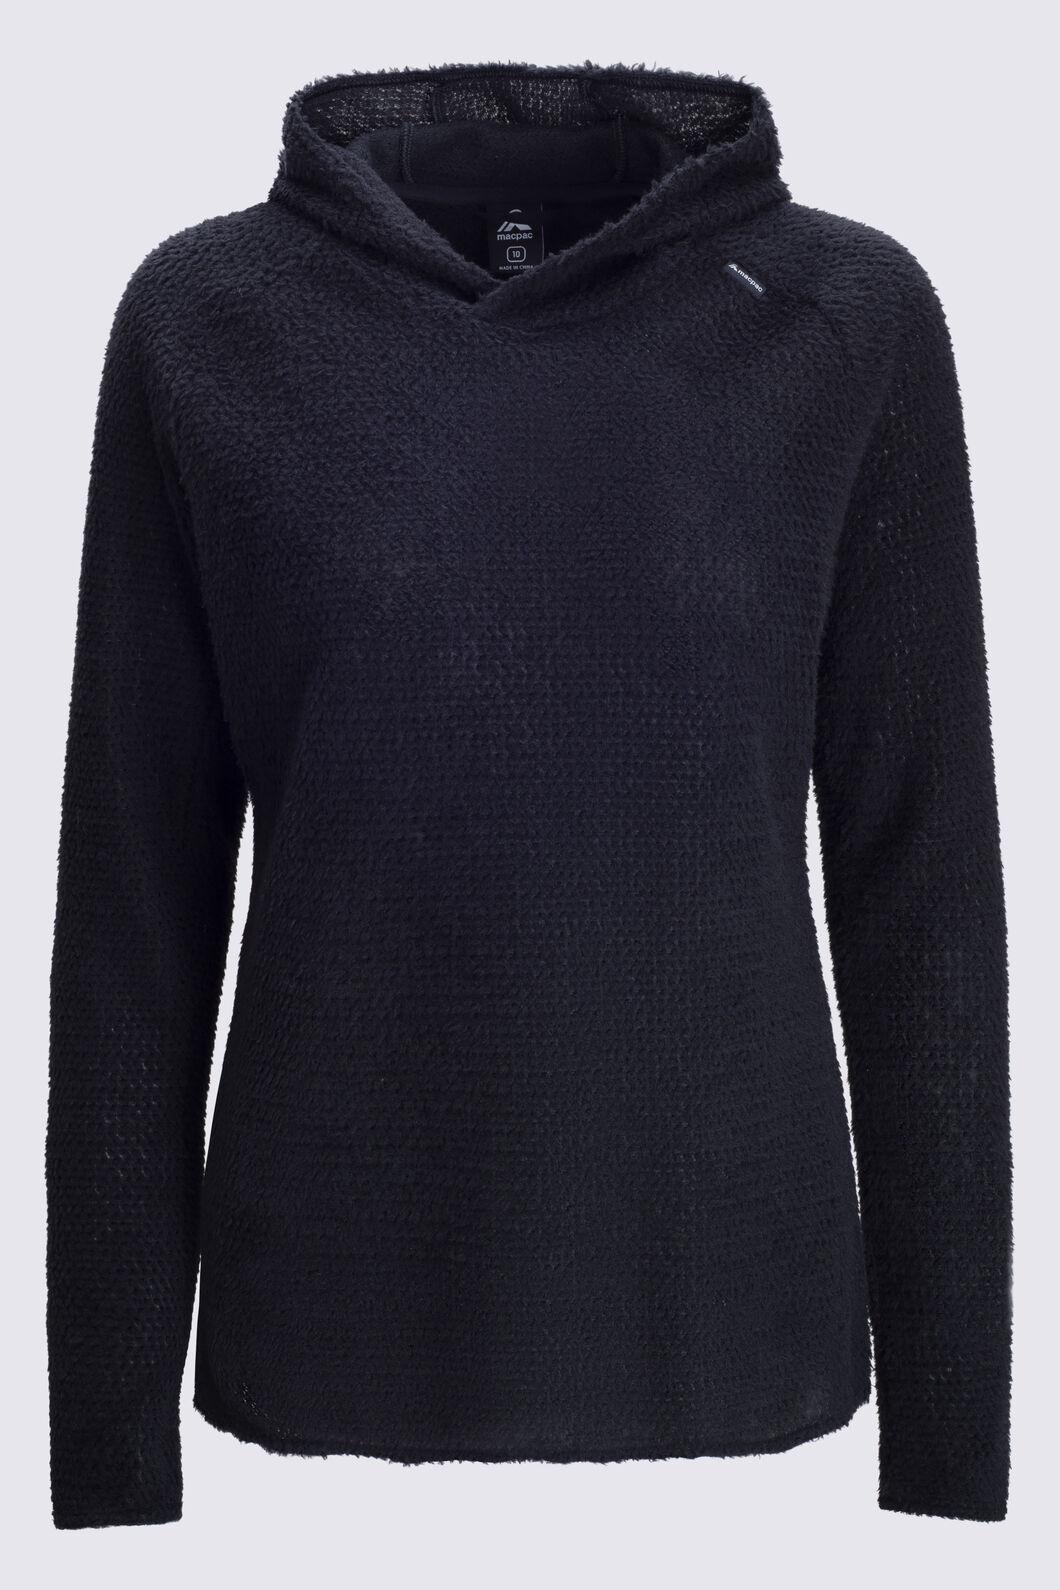 Macpac Women's Nitro Polartec® Alpha® Pullover, Black, hi-res